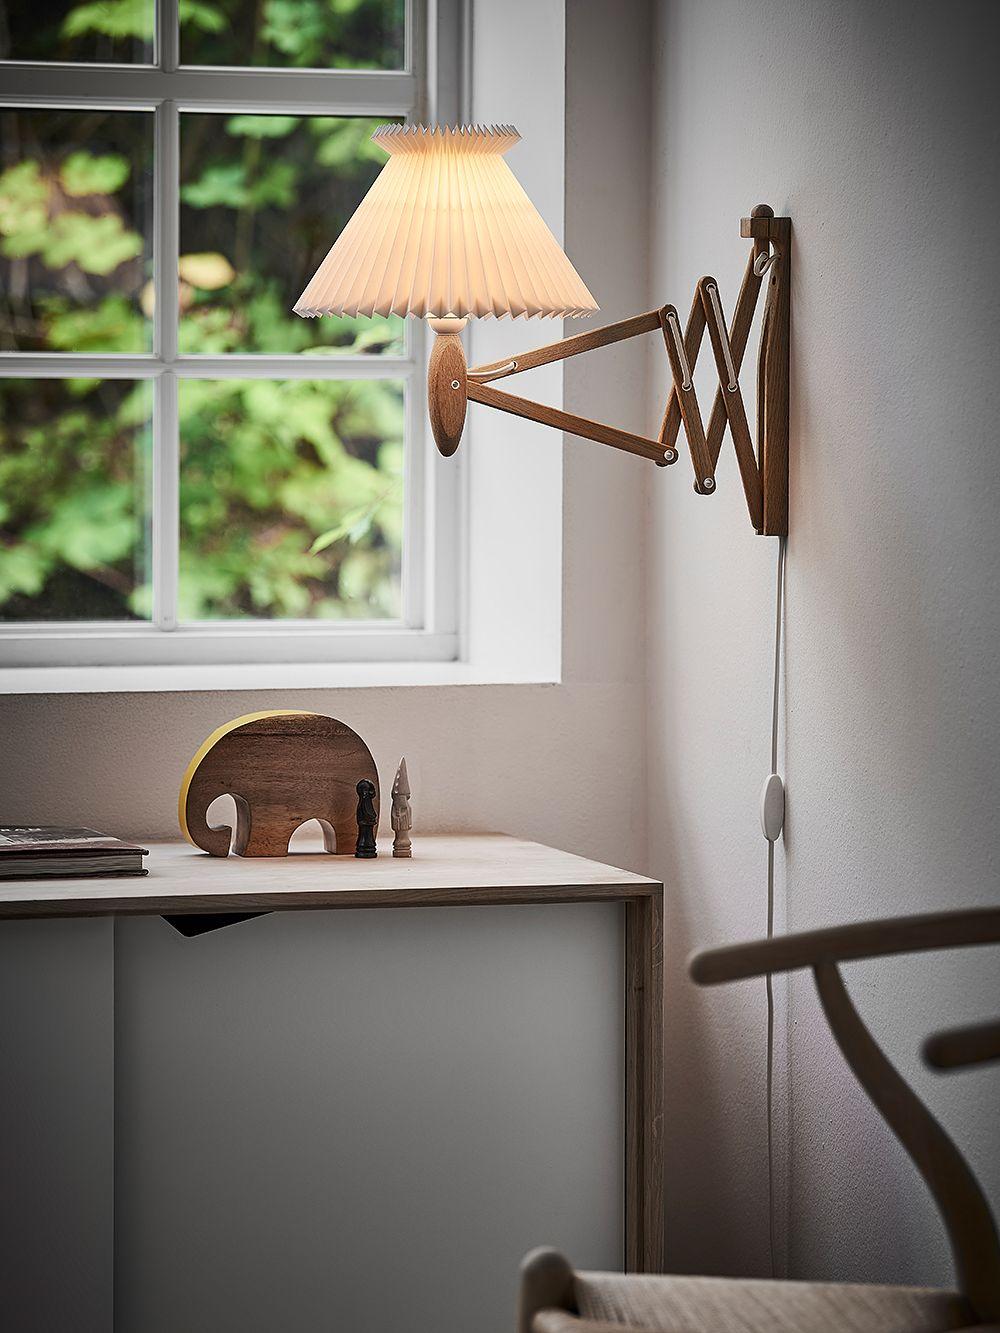 Le Klint Saxe lamp